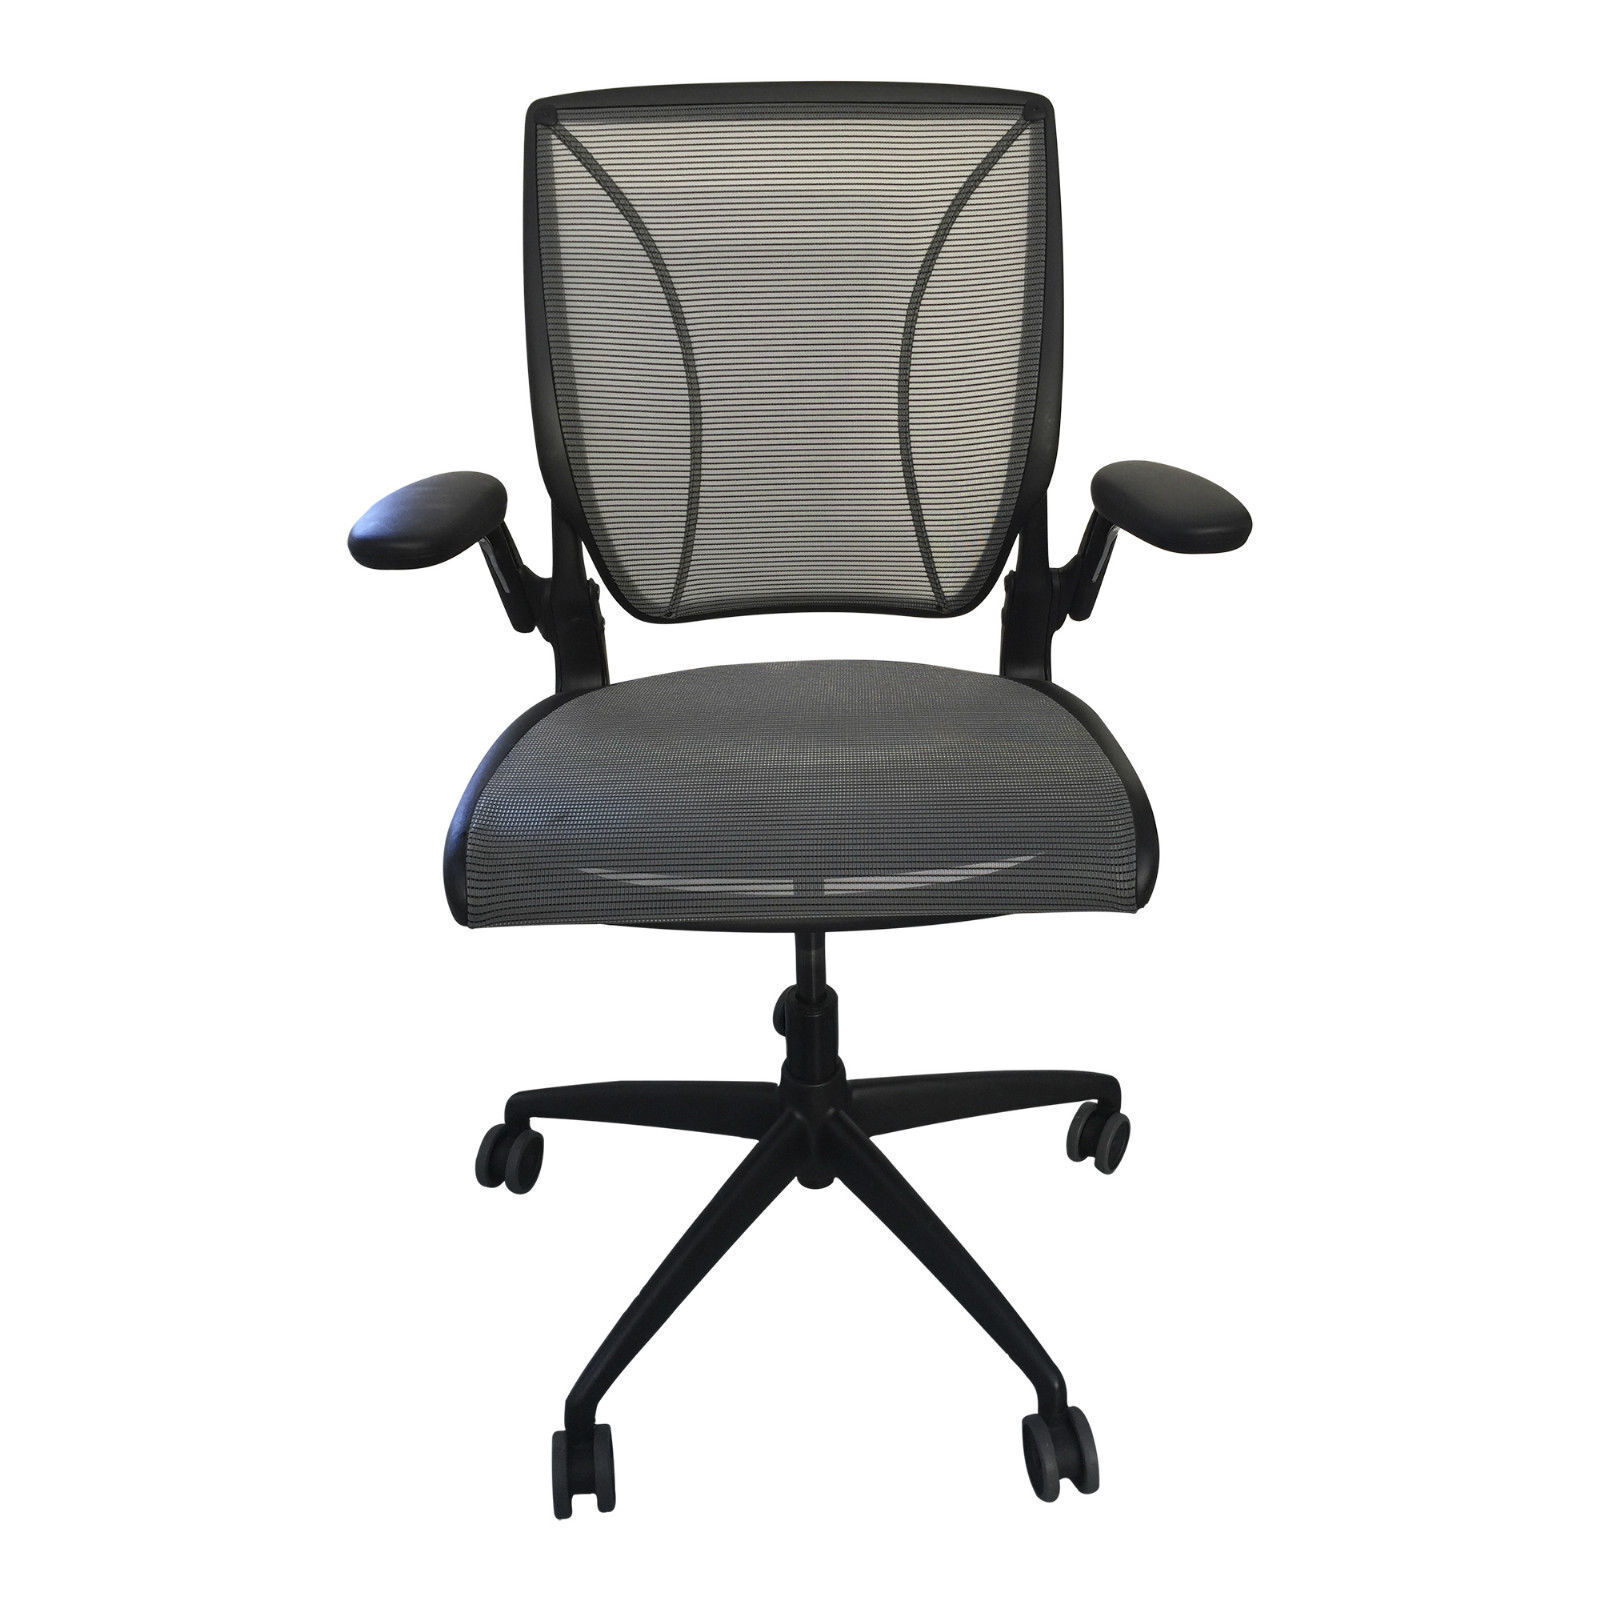 Top 10 Ergonomic Chairs